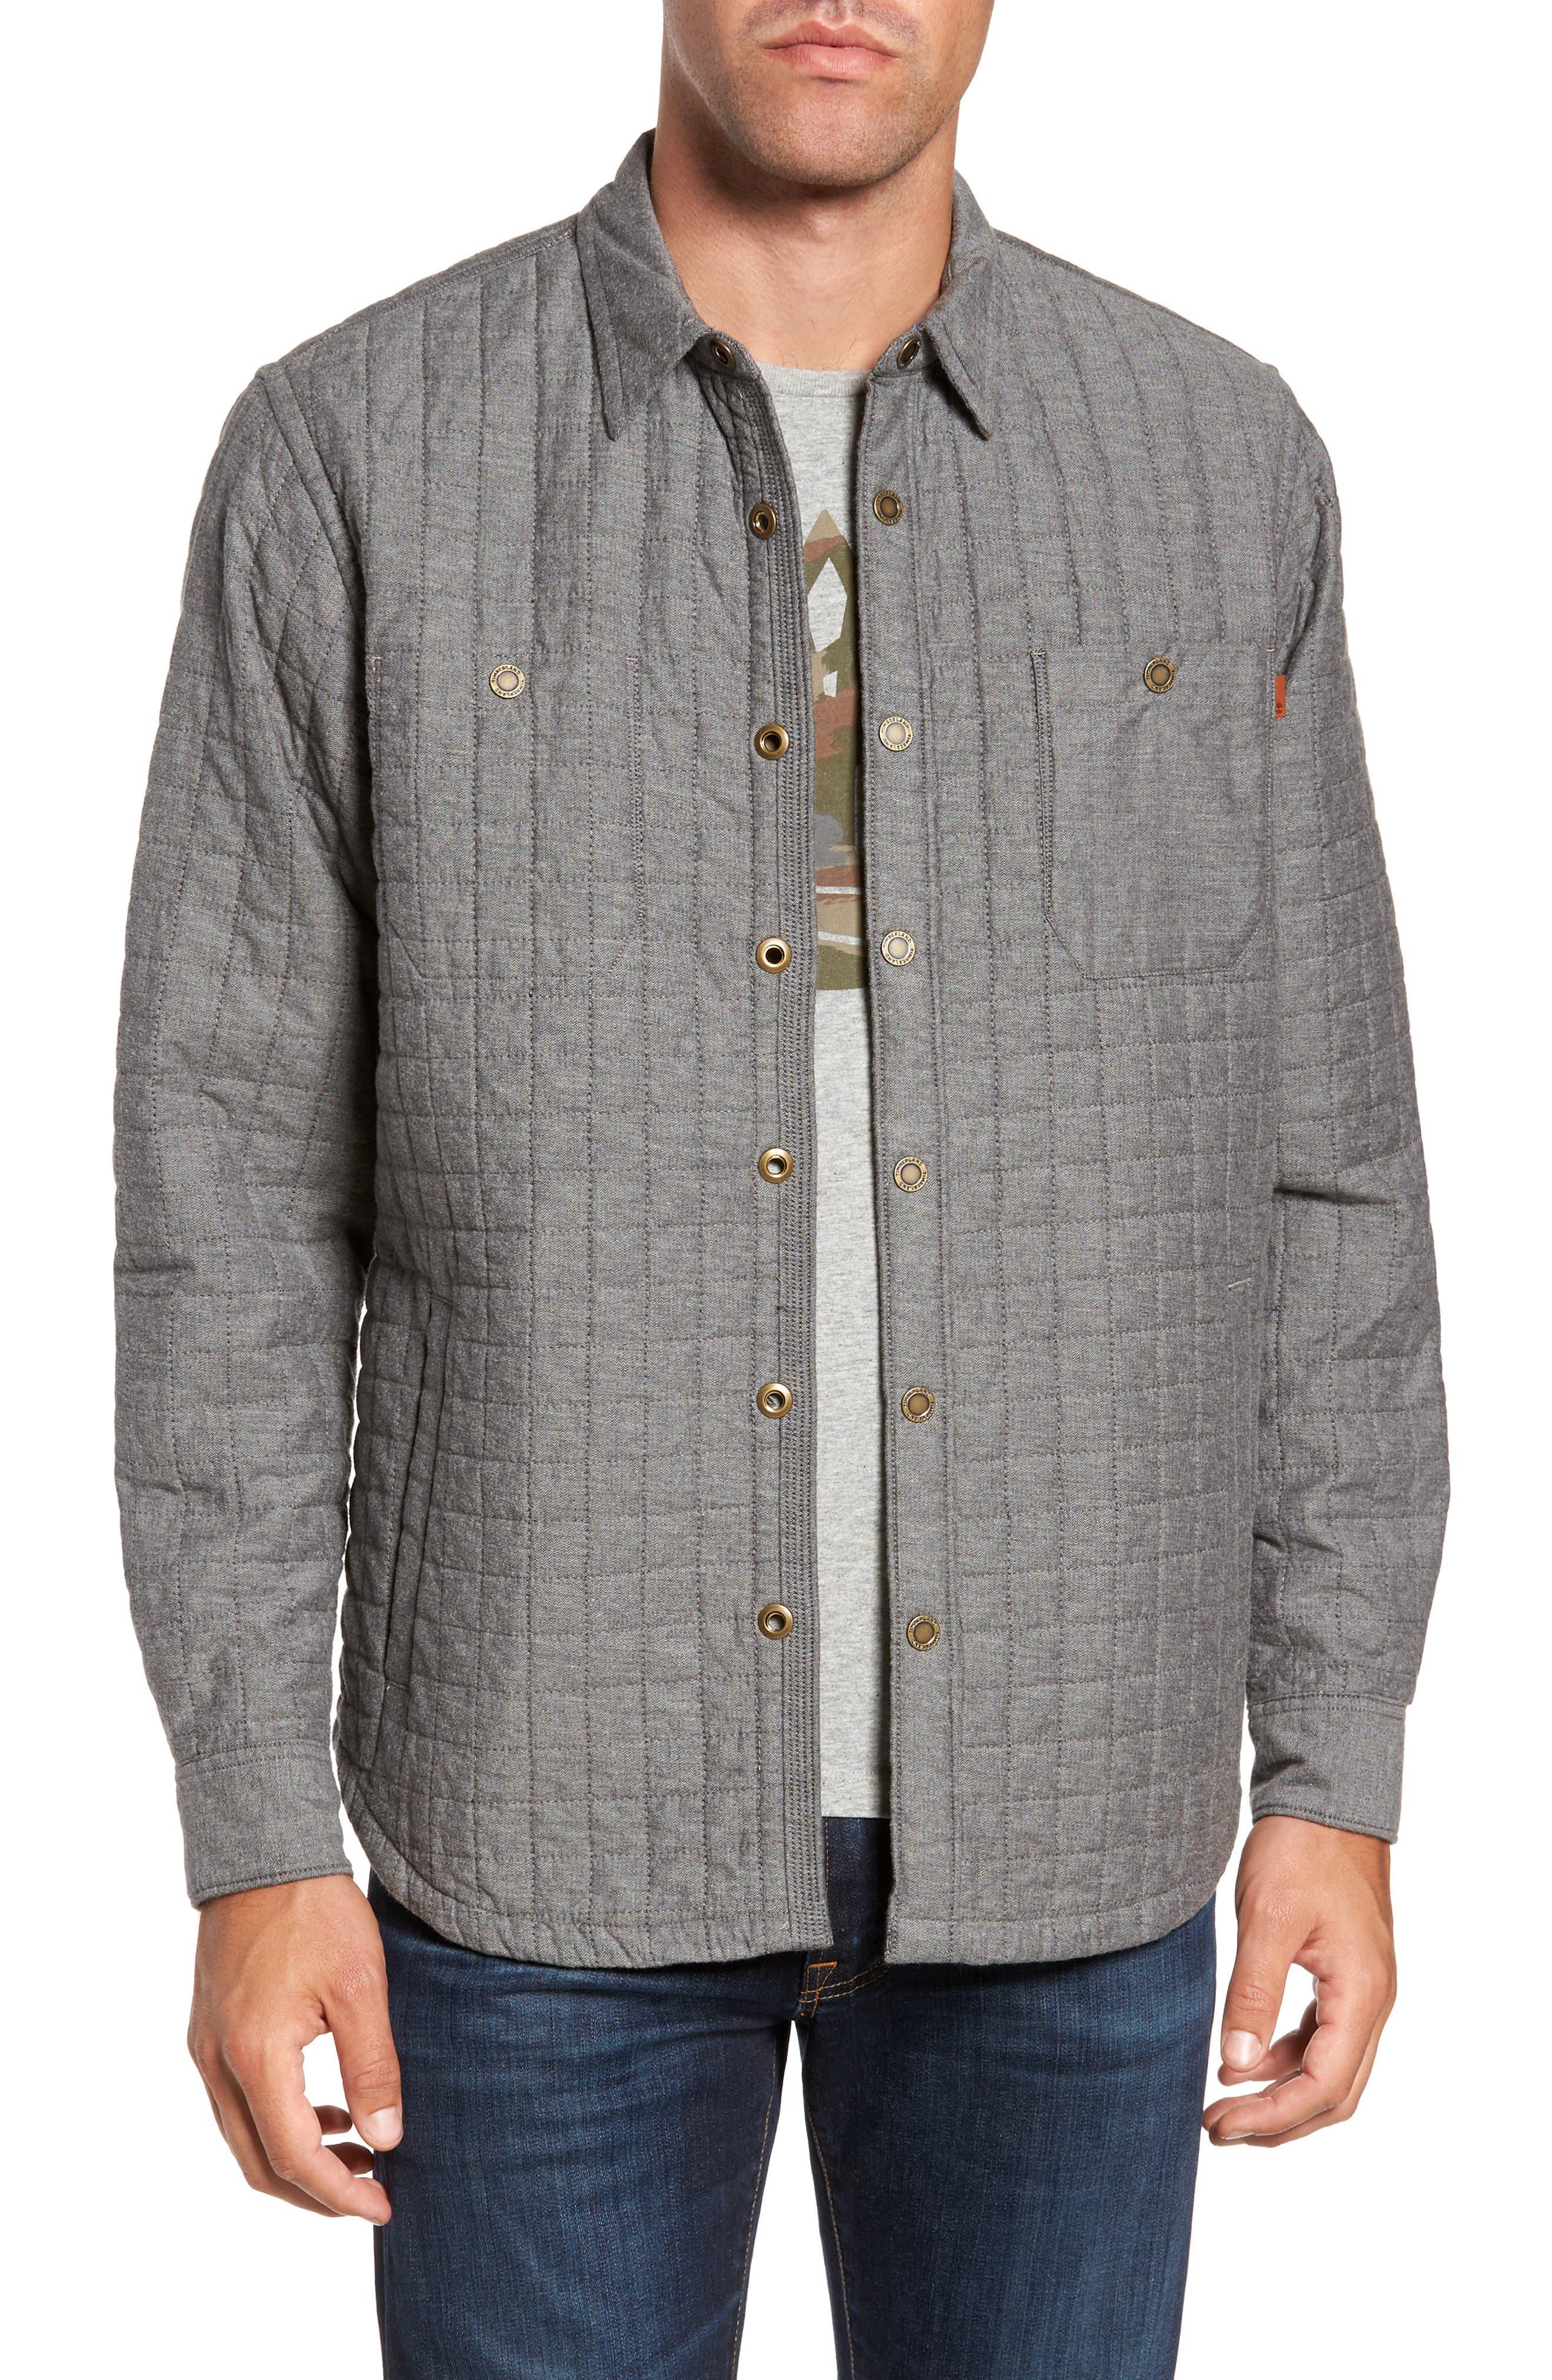 Gunstock River Lightweight Quilted Shirt Jacket,                             Main thumbnail 1, color,                             001